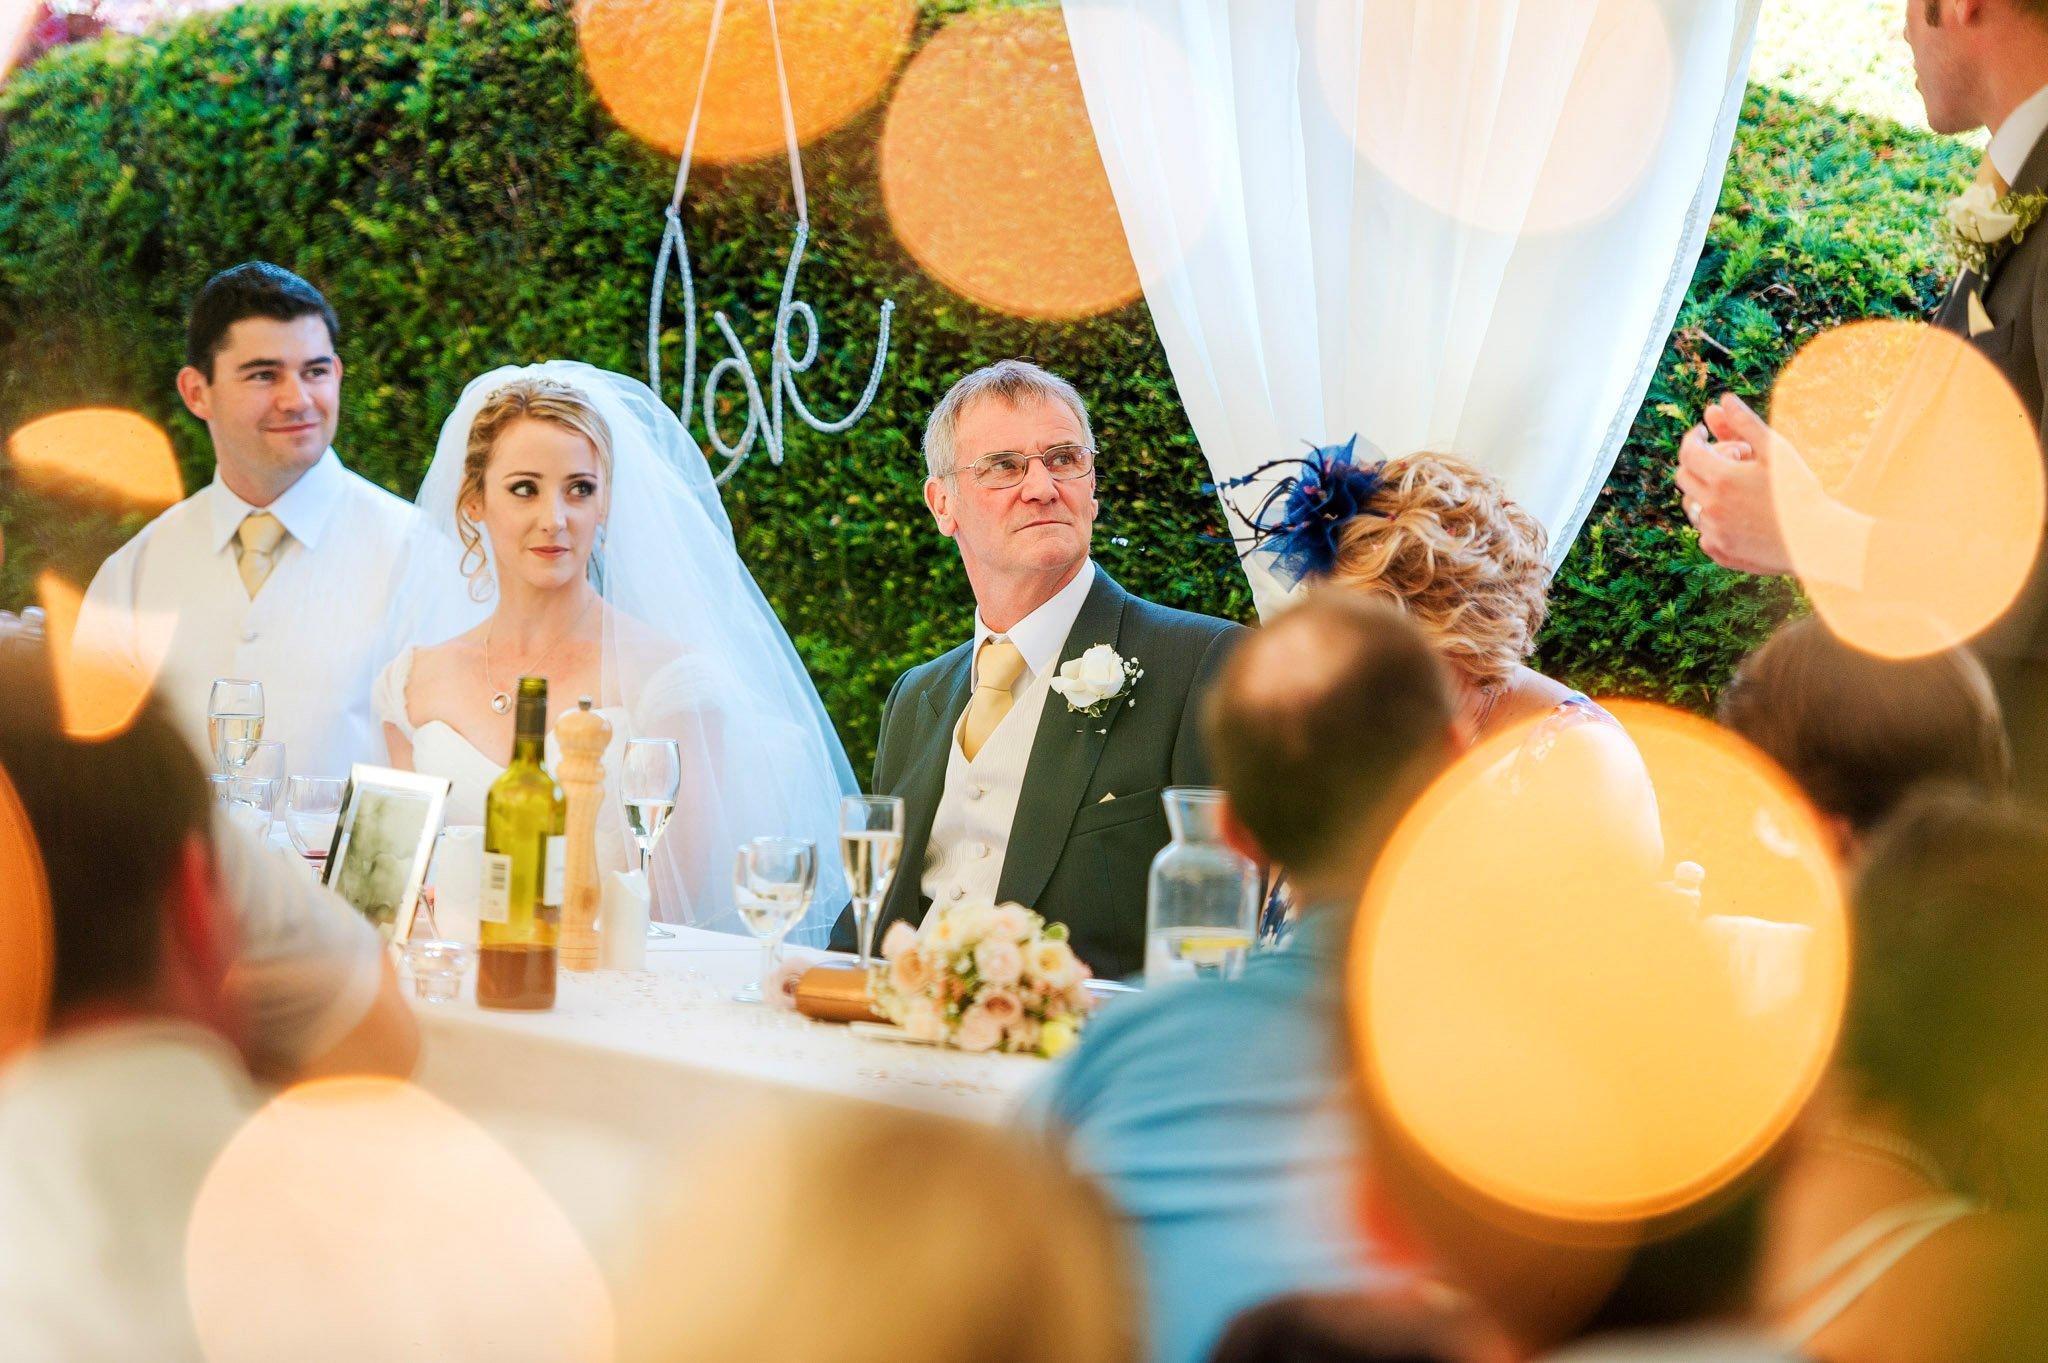 Georgina + Mike - Wedding photography in Malvern, Worcestershire 55